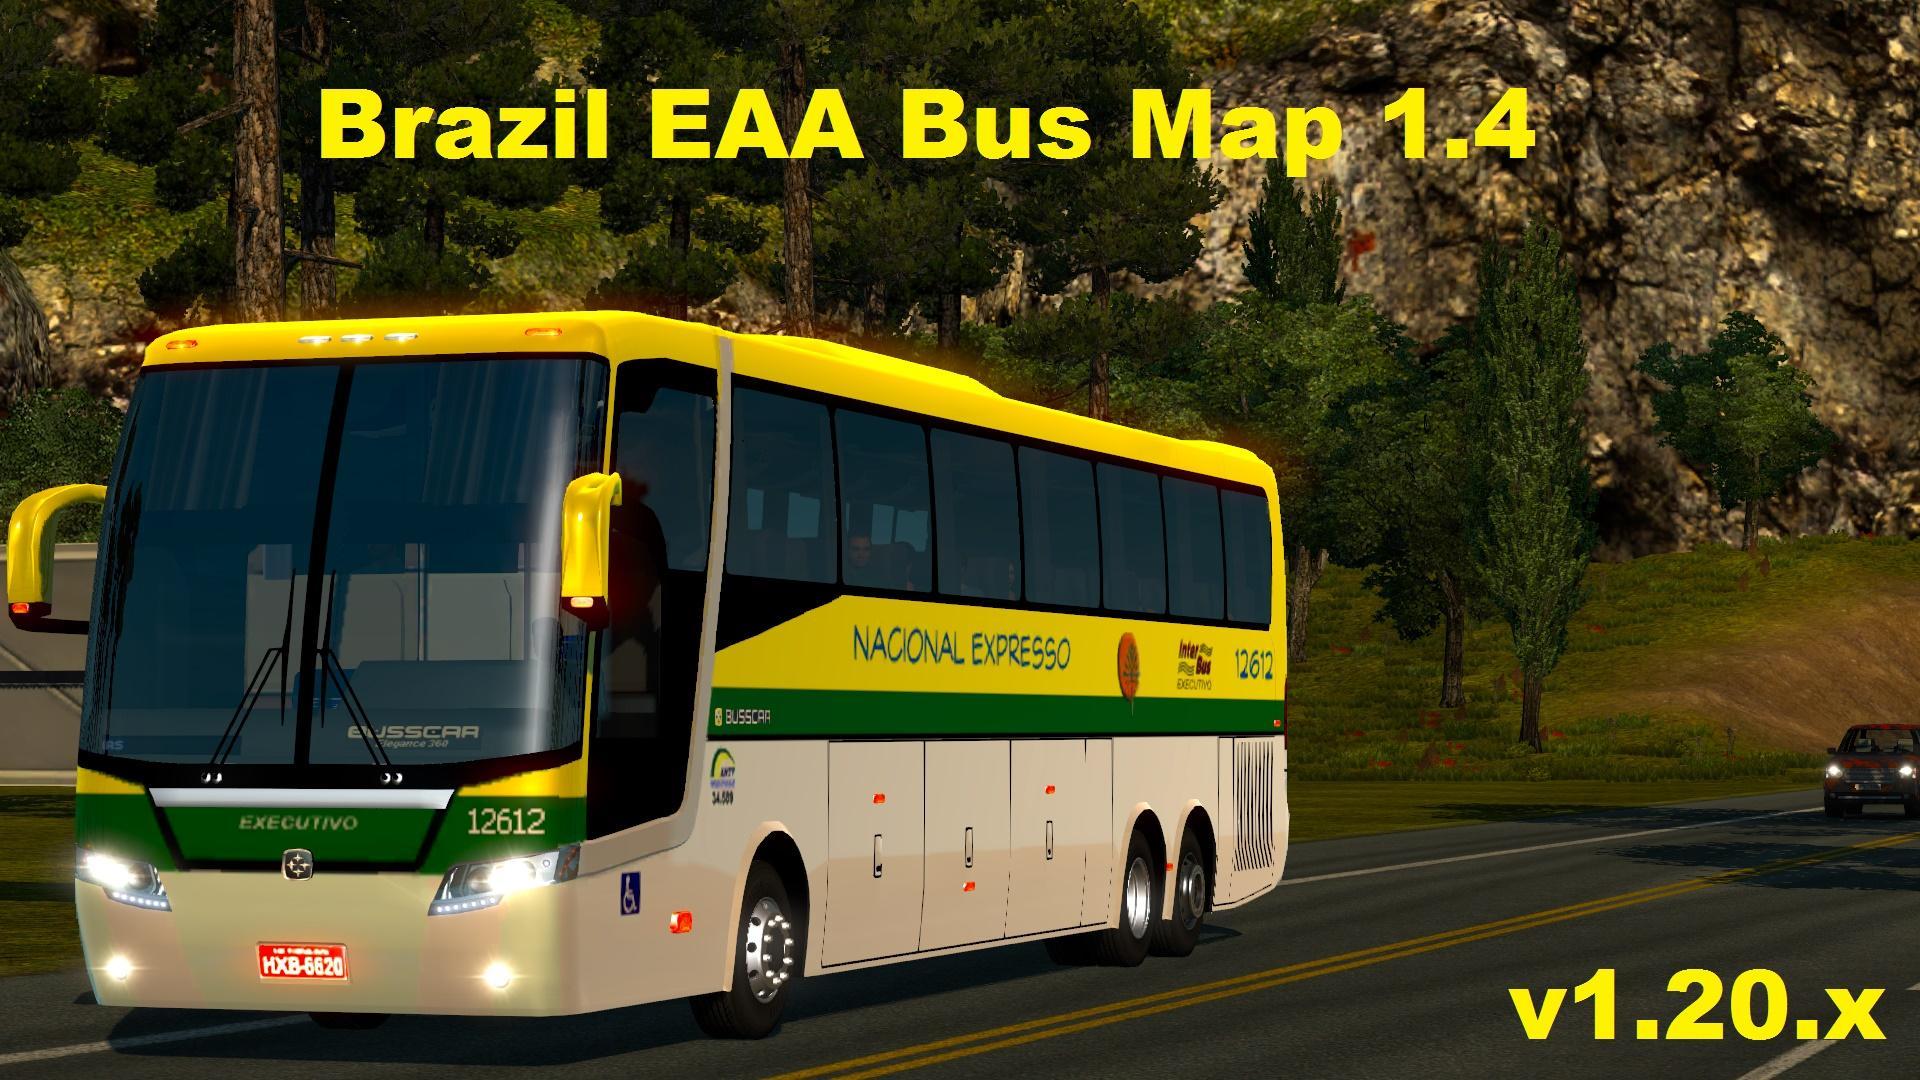 Eaa bus pack v1 6 mod euro truck simulator 2 mods - Brazil Eaa Bus Map 1 4 1 20 Modhub Us